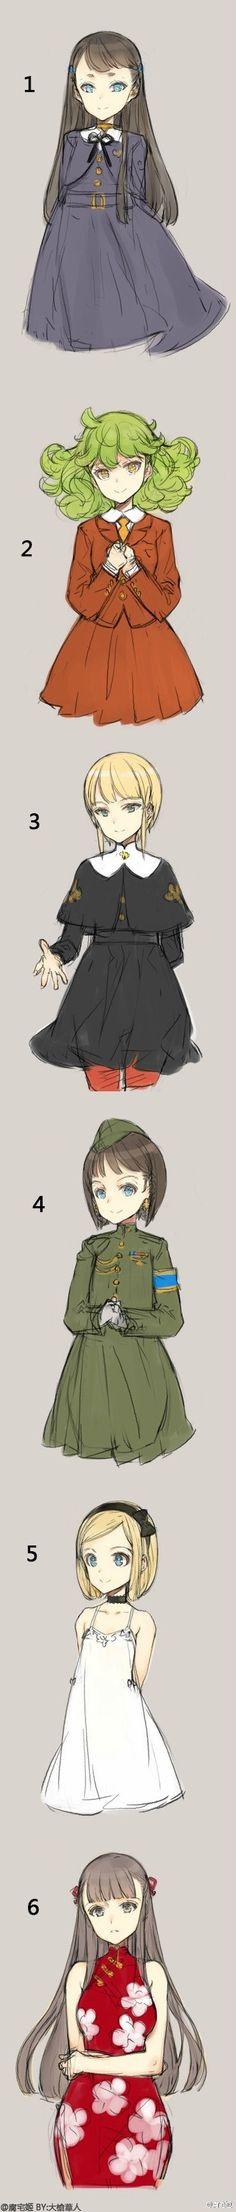 The Best Pictures Anime Ecchi Hentai! [*o^] http://dark-lk.wix.com/epicwallcz/ HD Hentai Pics, Drawing Anime, Ecchi Girls, Manga Doujinshi Hentai, Anime Wallpapers, Comics Cartoon, Hottest Pictures +18 NSFW https://epicwallcz.wordpress.com